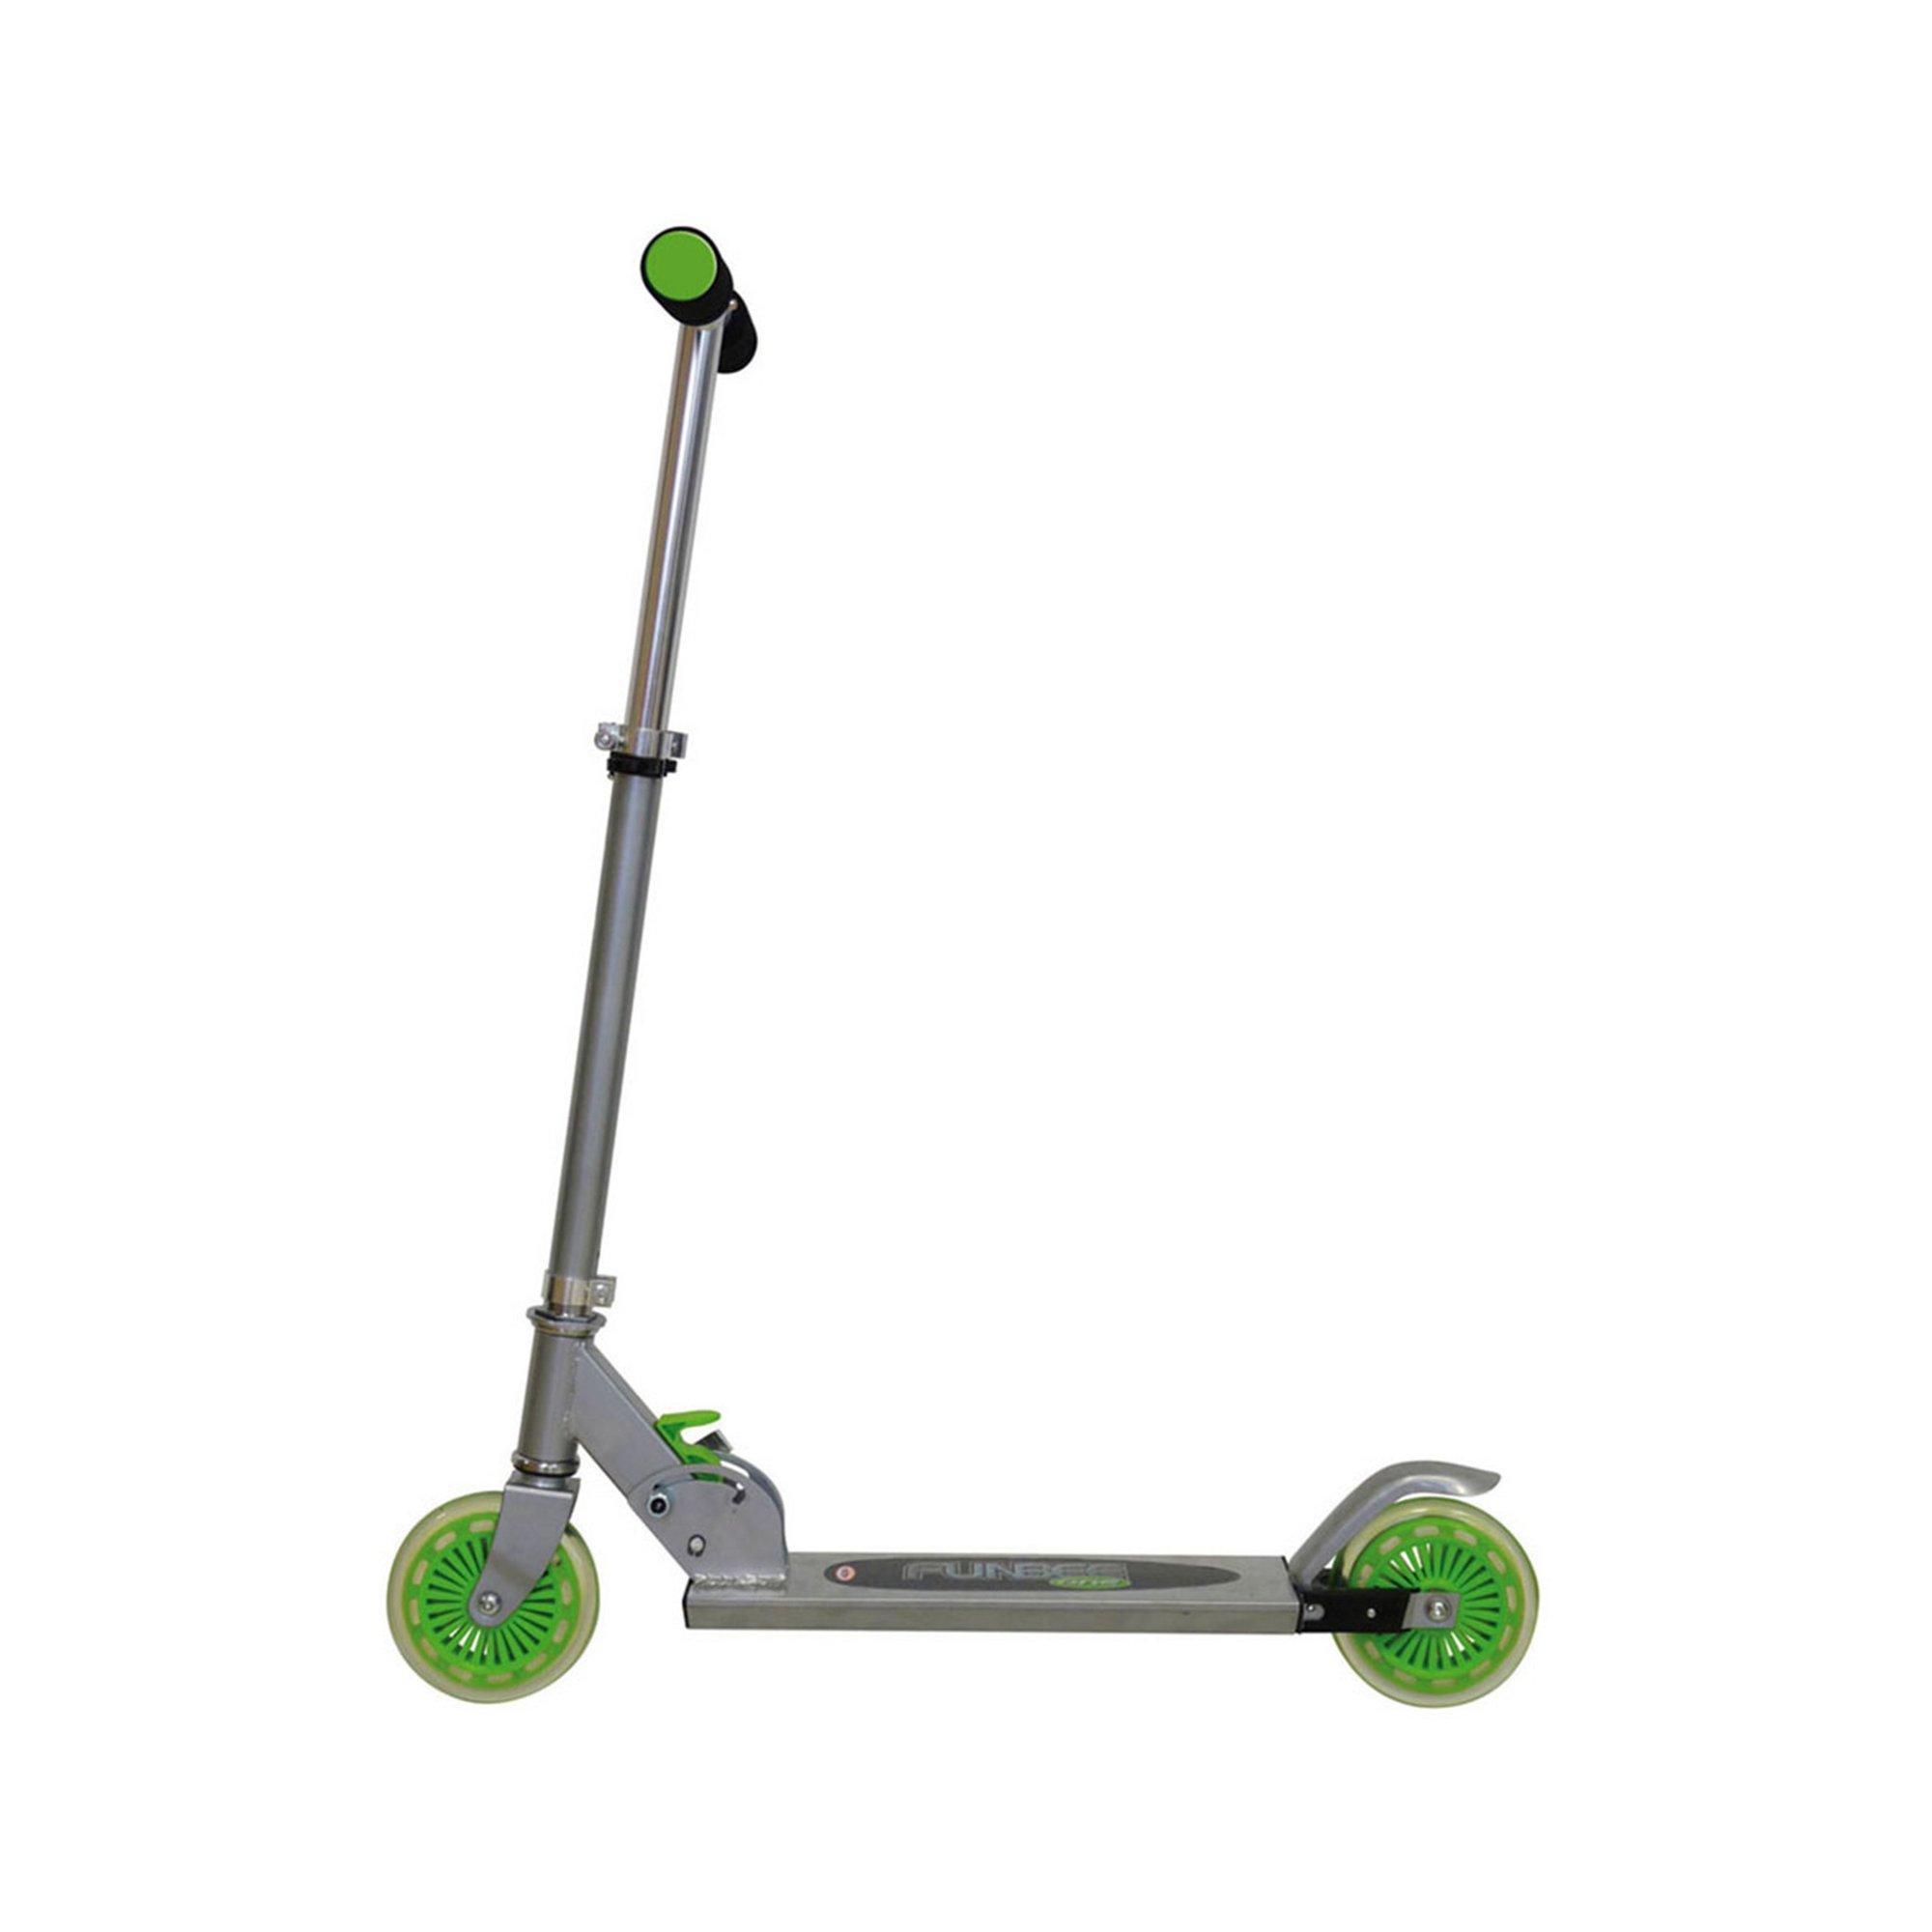 Image of Funbee One Aluminium 2 Wheel Scooter